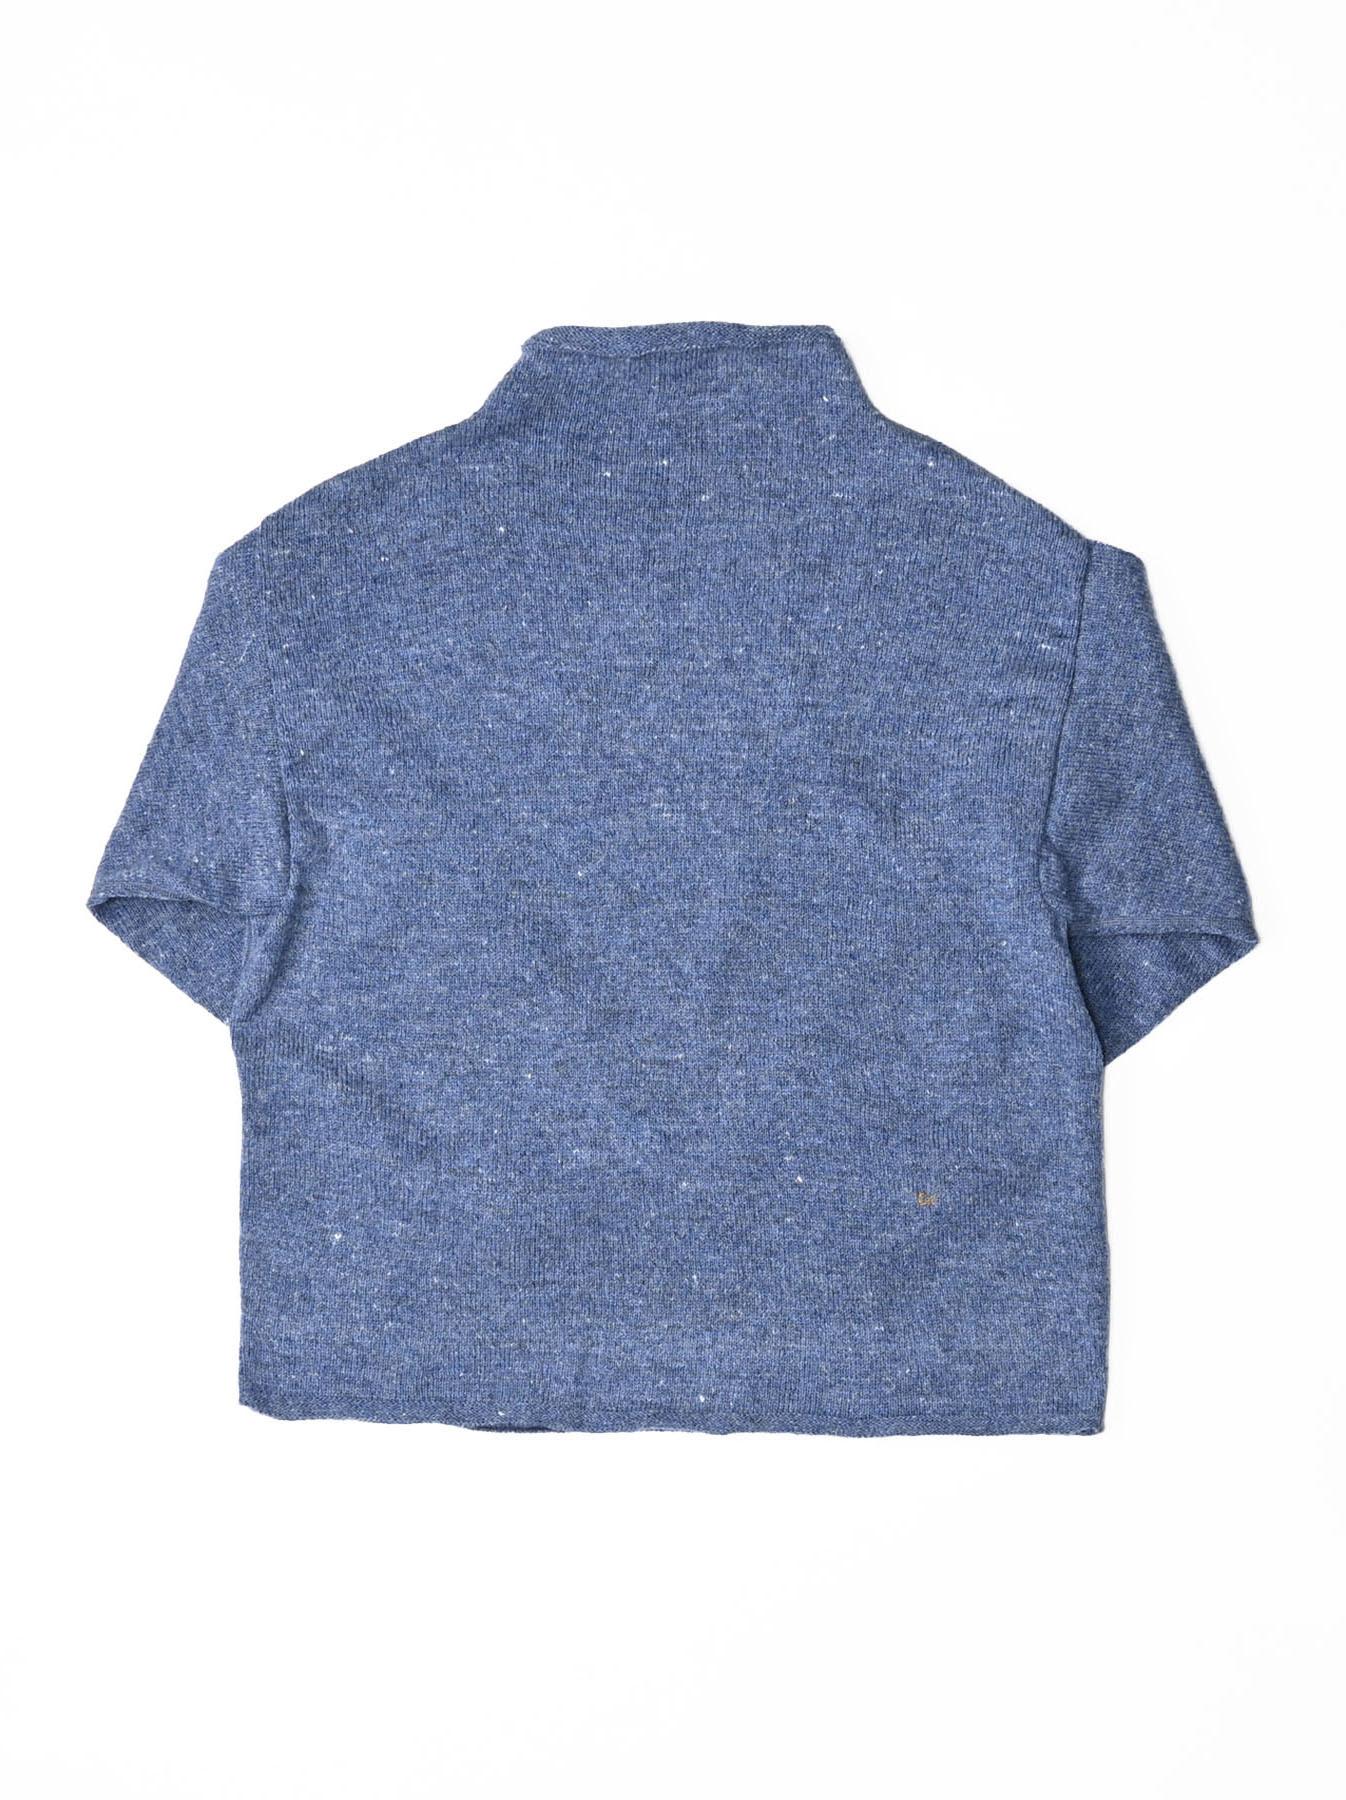 Cotton Shetland Knit-sew Mockneck Sweater-5